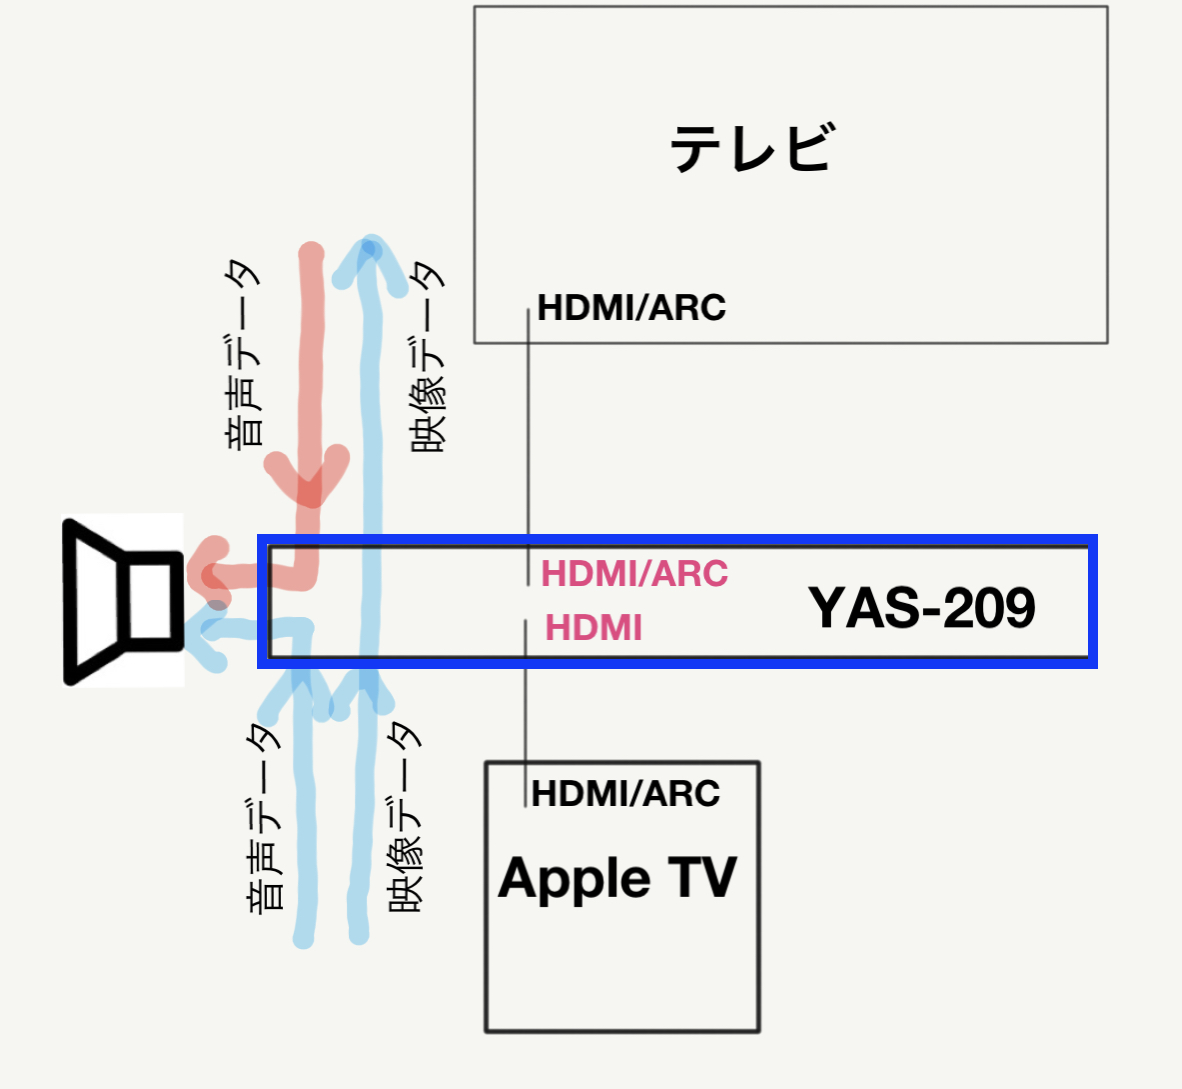 f:id:KuriKumaChan:20210721211720p:plain